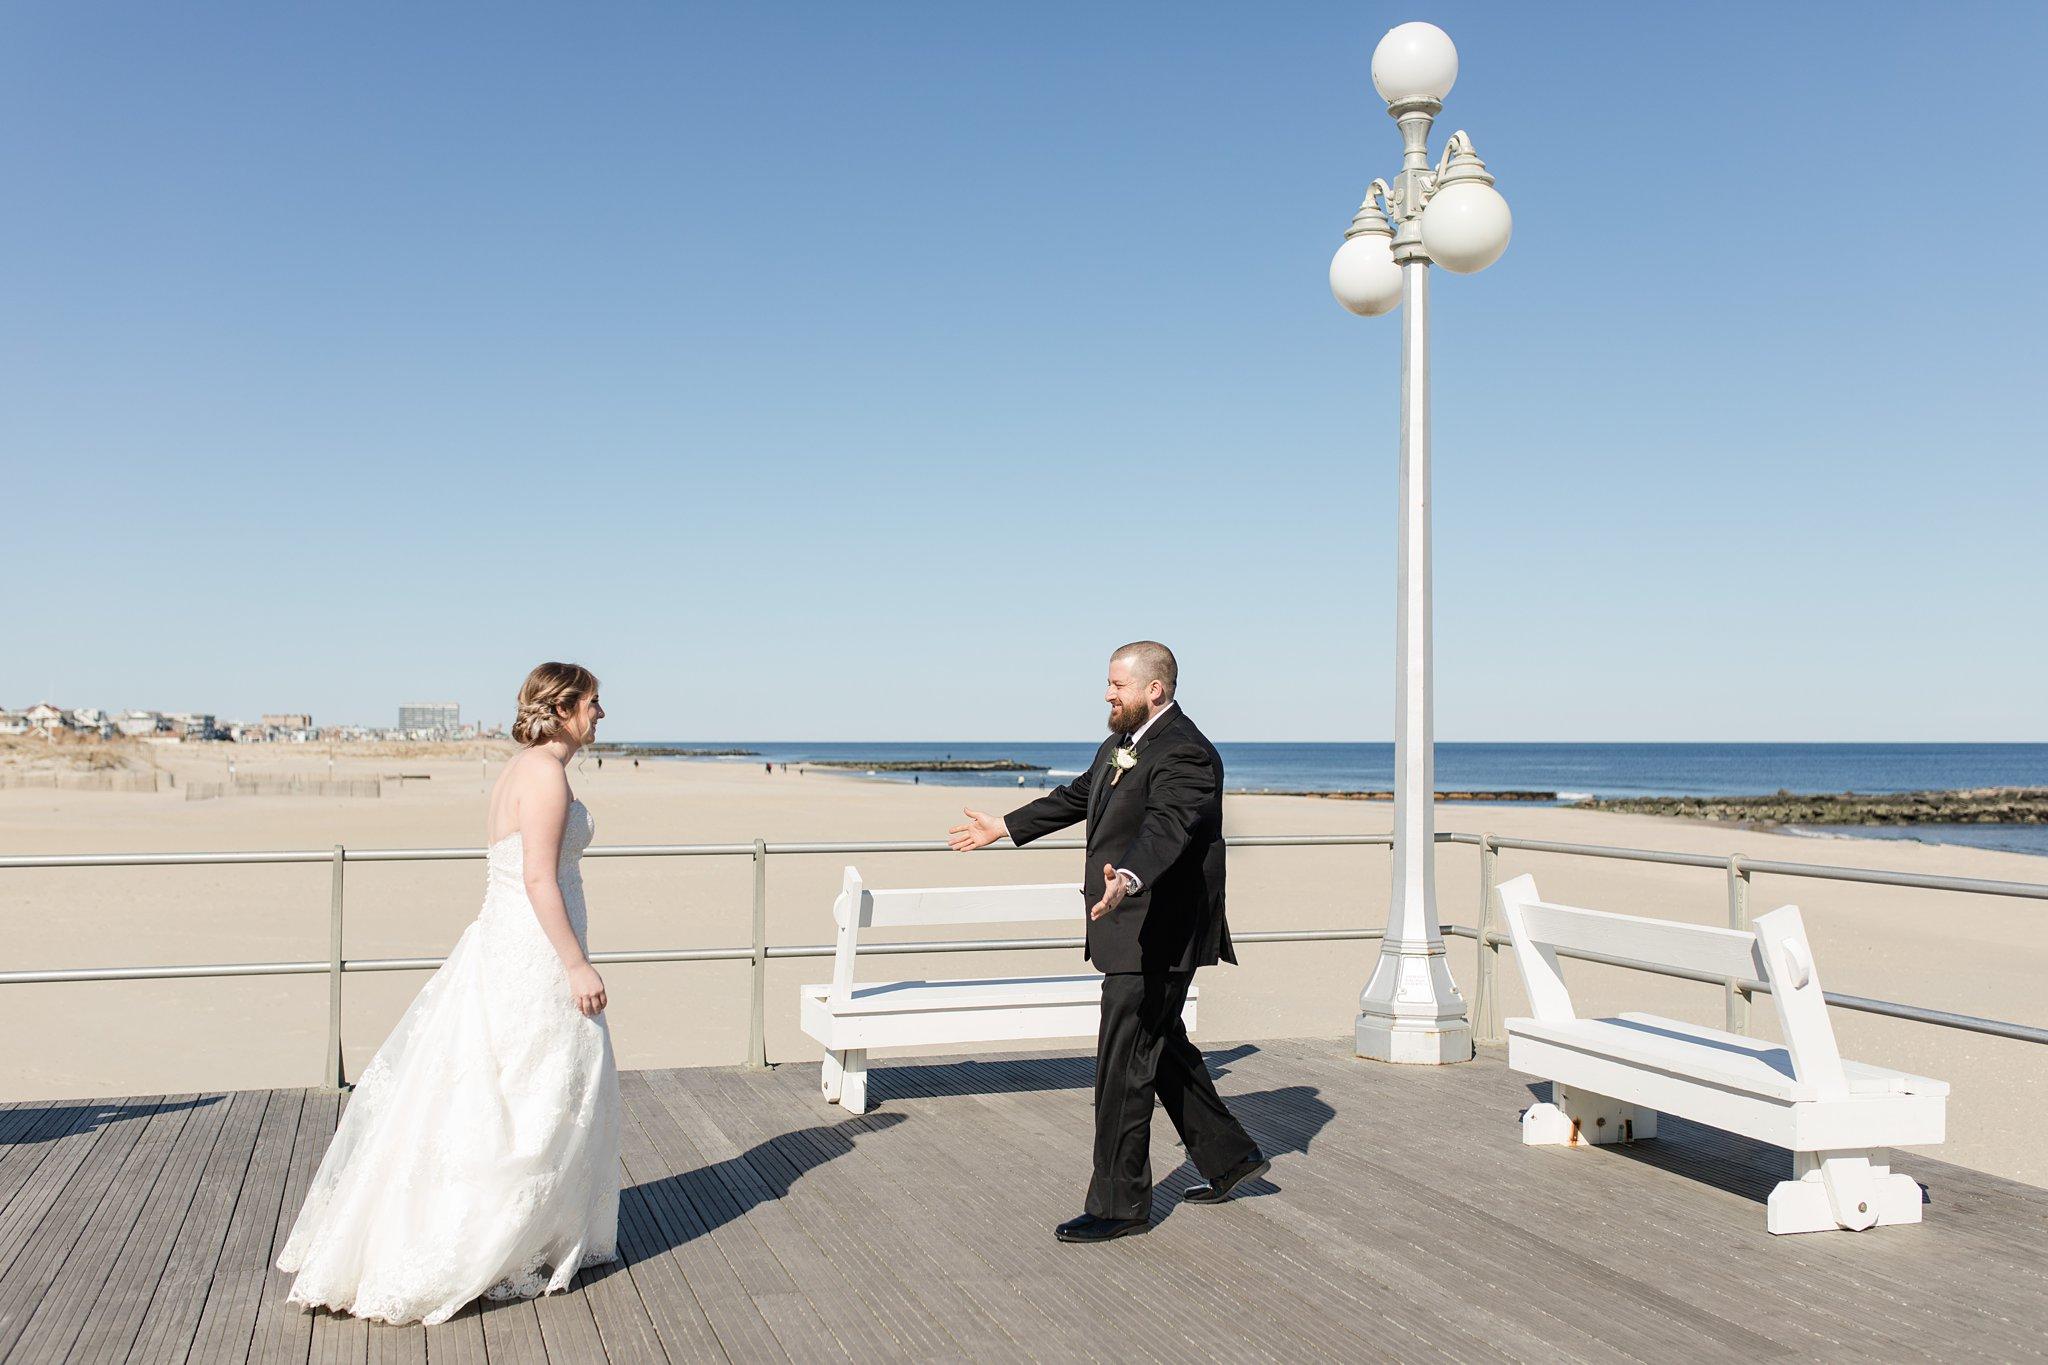 Wedding Pictures Asbury Park Boardwalk